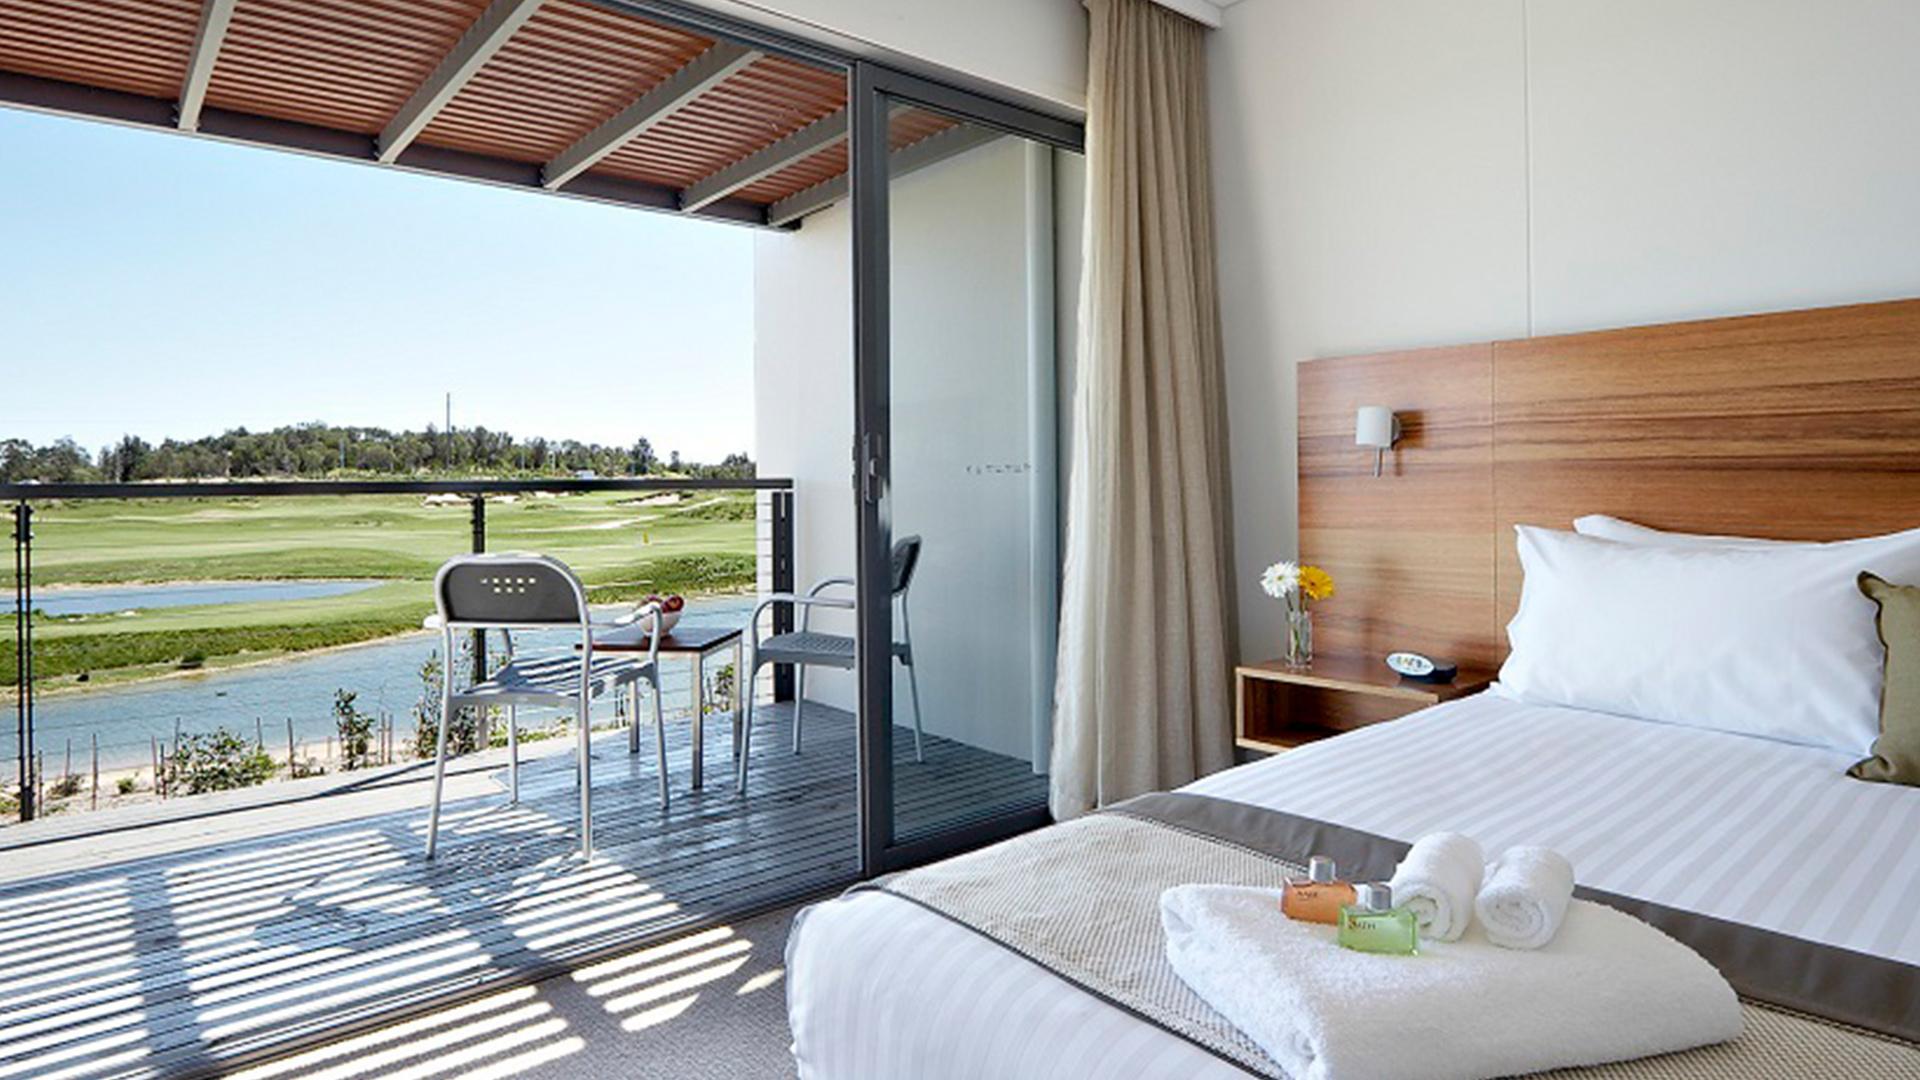 Studio Guestroom 2020 image 1 at Pullman Magenta Shores Resort by Wyong Shire Council, New South Wales, Australia